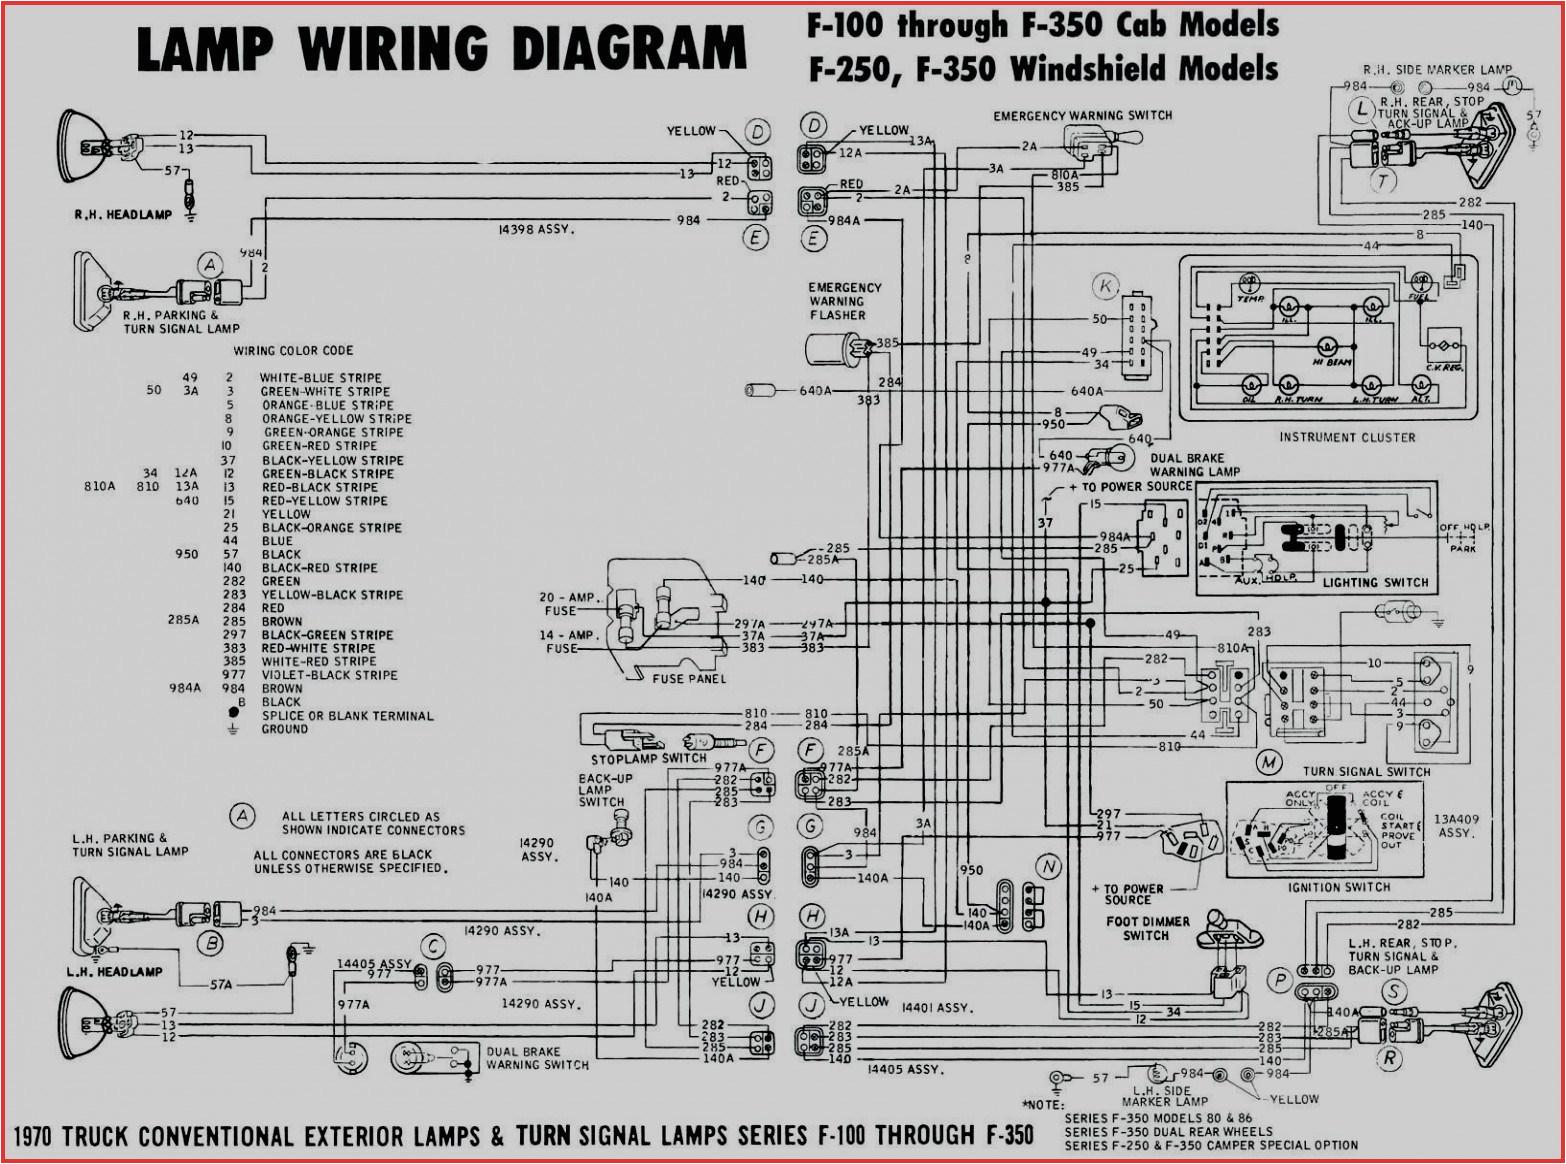 230v 3 phase motor wiring diagram 3 phase starter wiring diagram detailed schematics diagram of 230v 3 phase motor wiring diagram 1 jpg